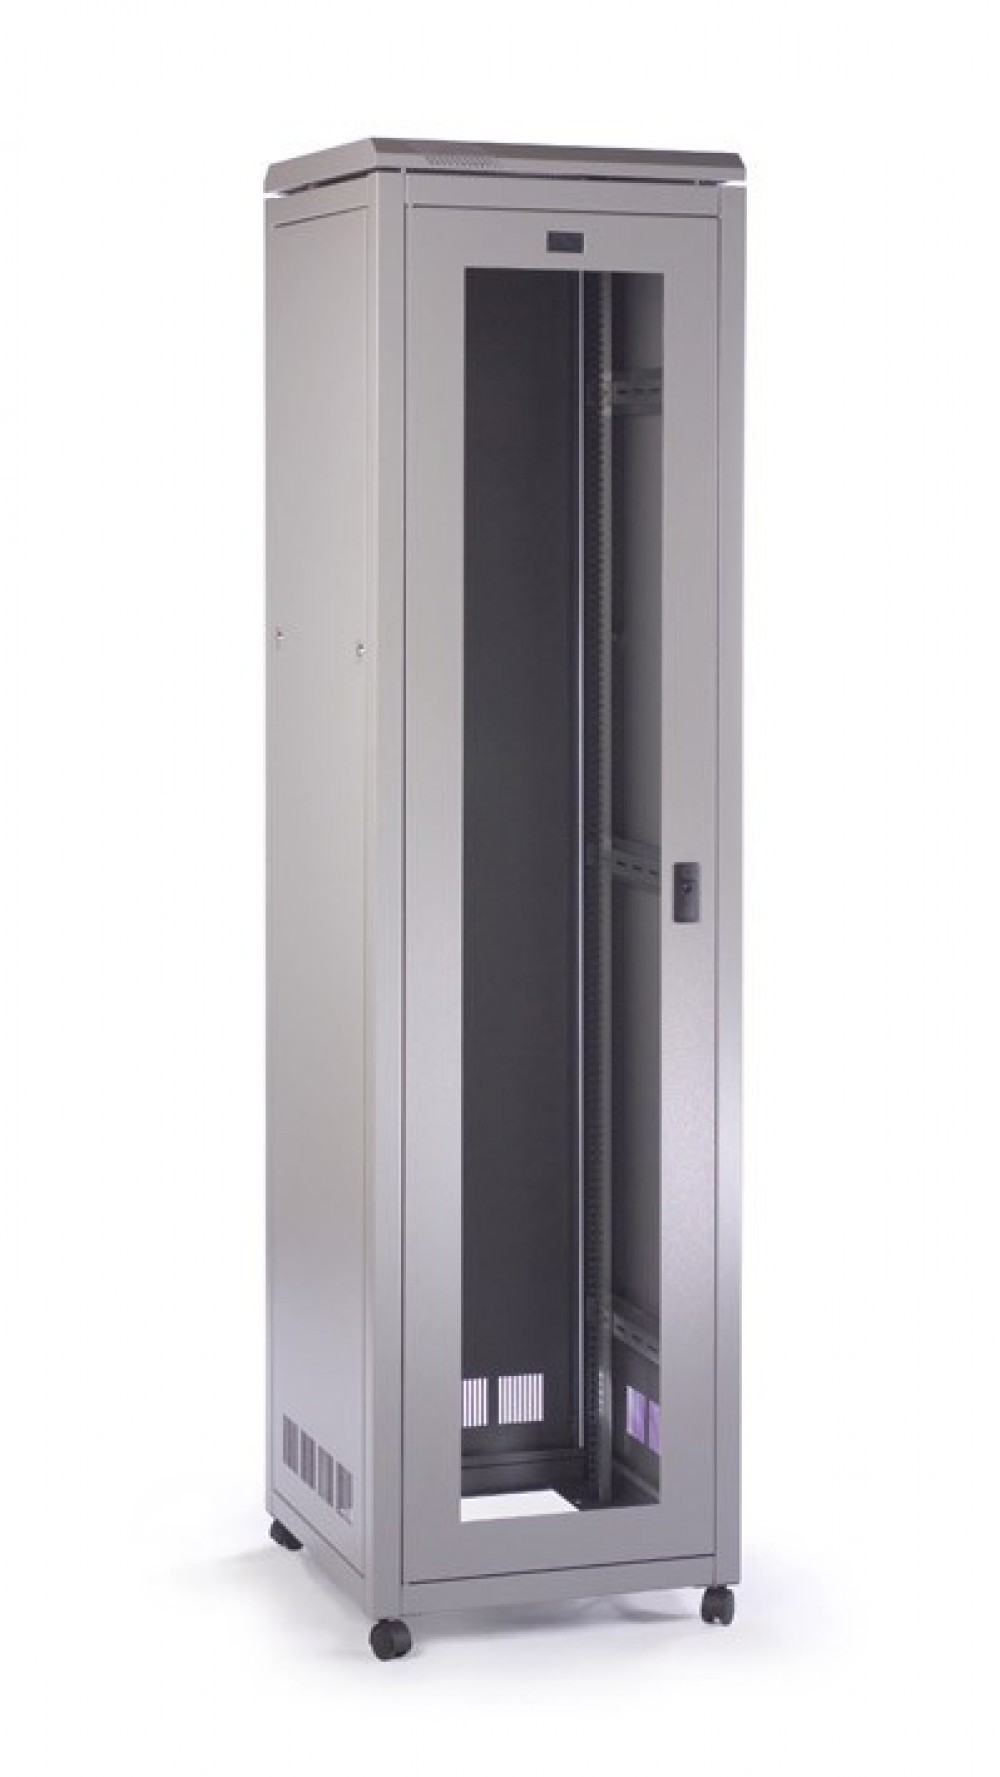 Prism Free Standing Cabinet 47U (2205x600x600)